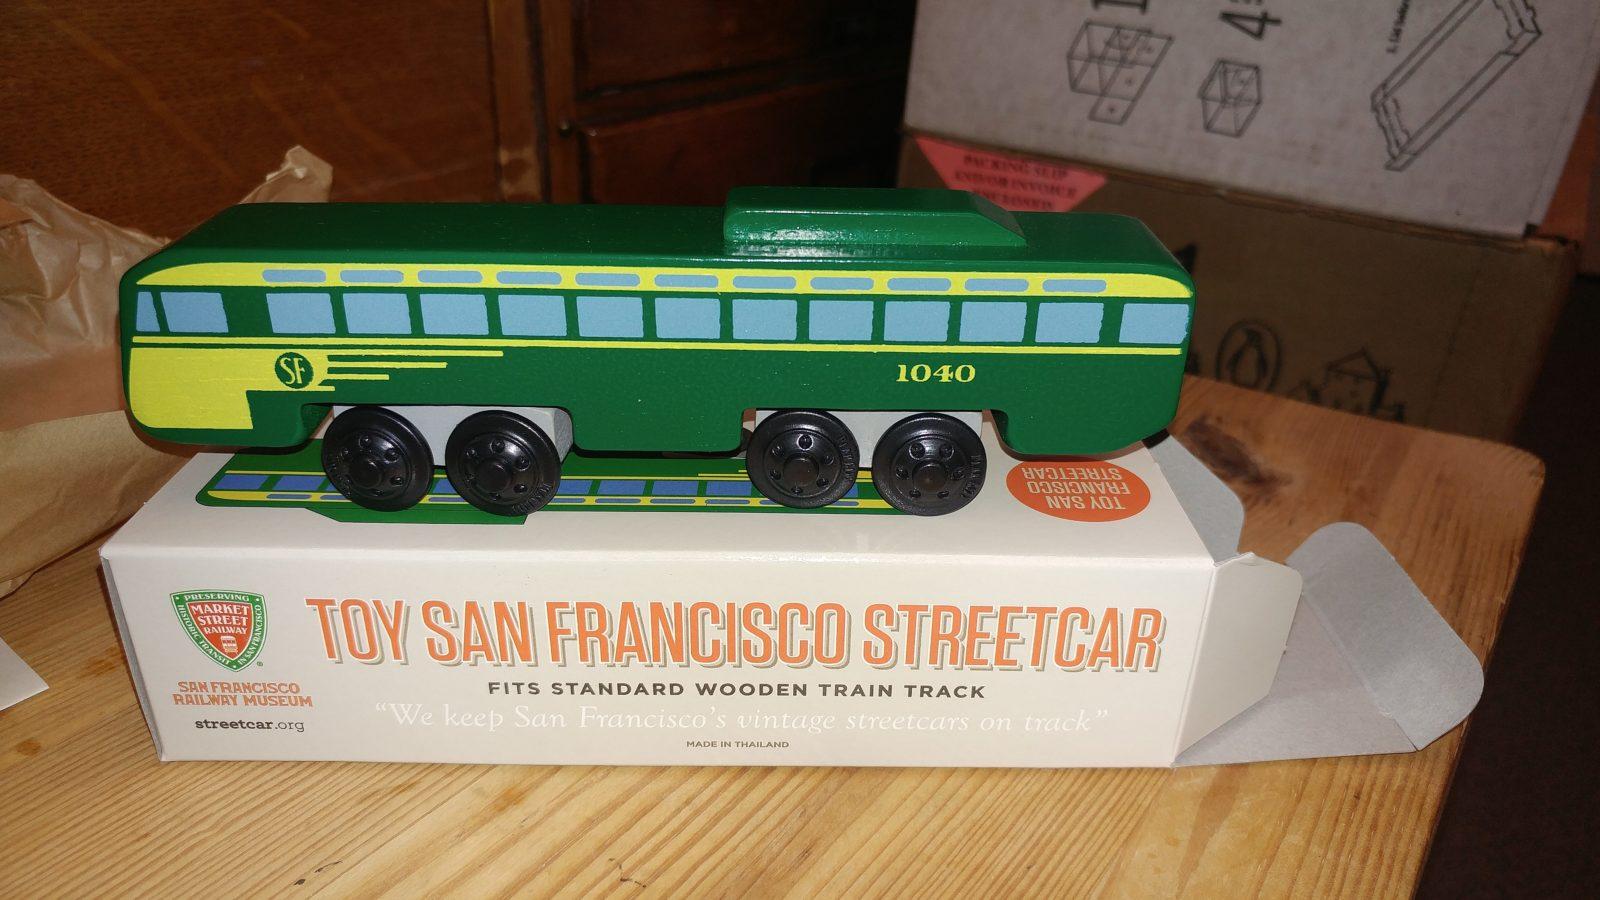 Toy Pcc Streetcar For Kids Wooden Train Sets Market Street Railway